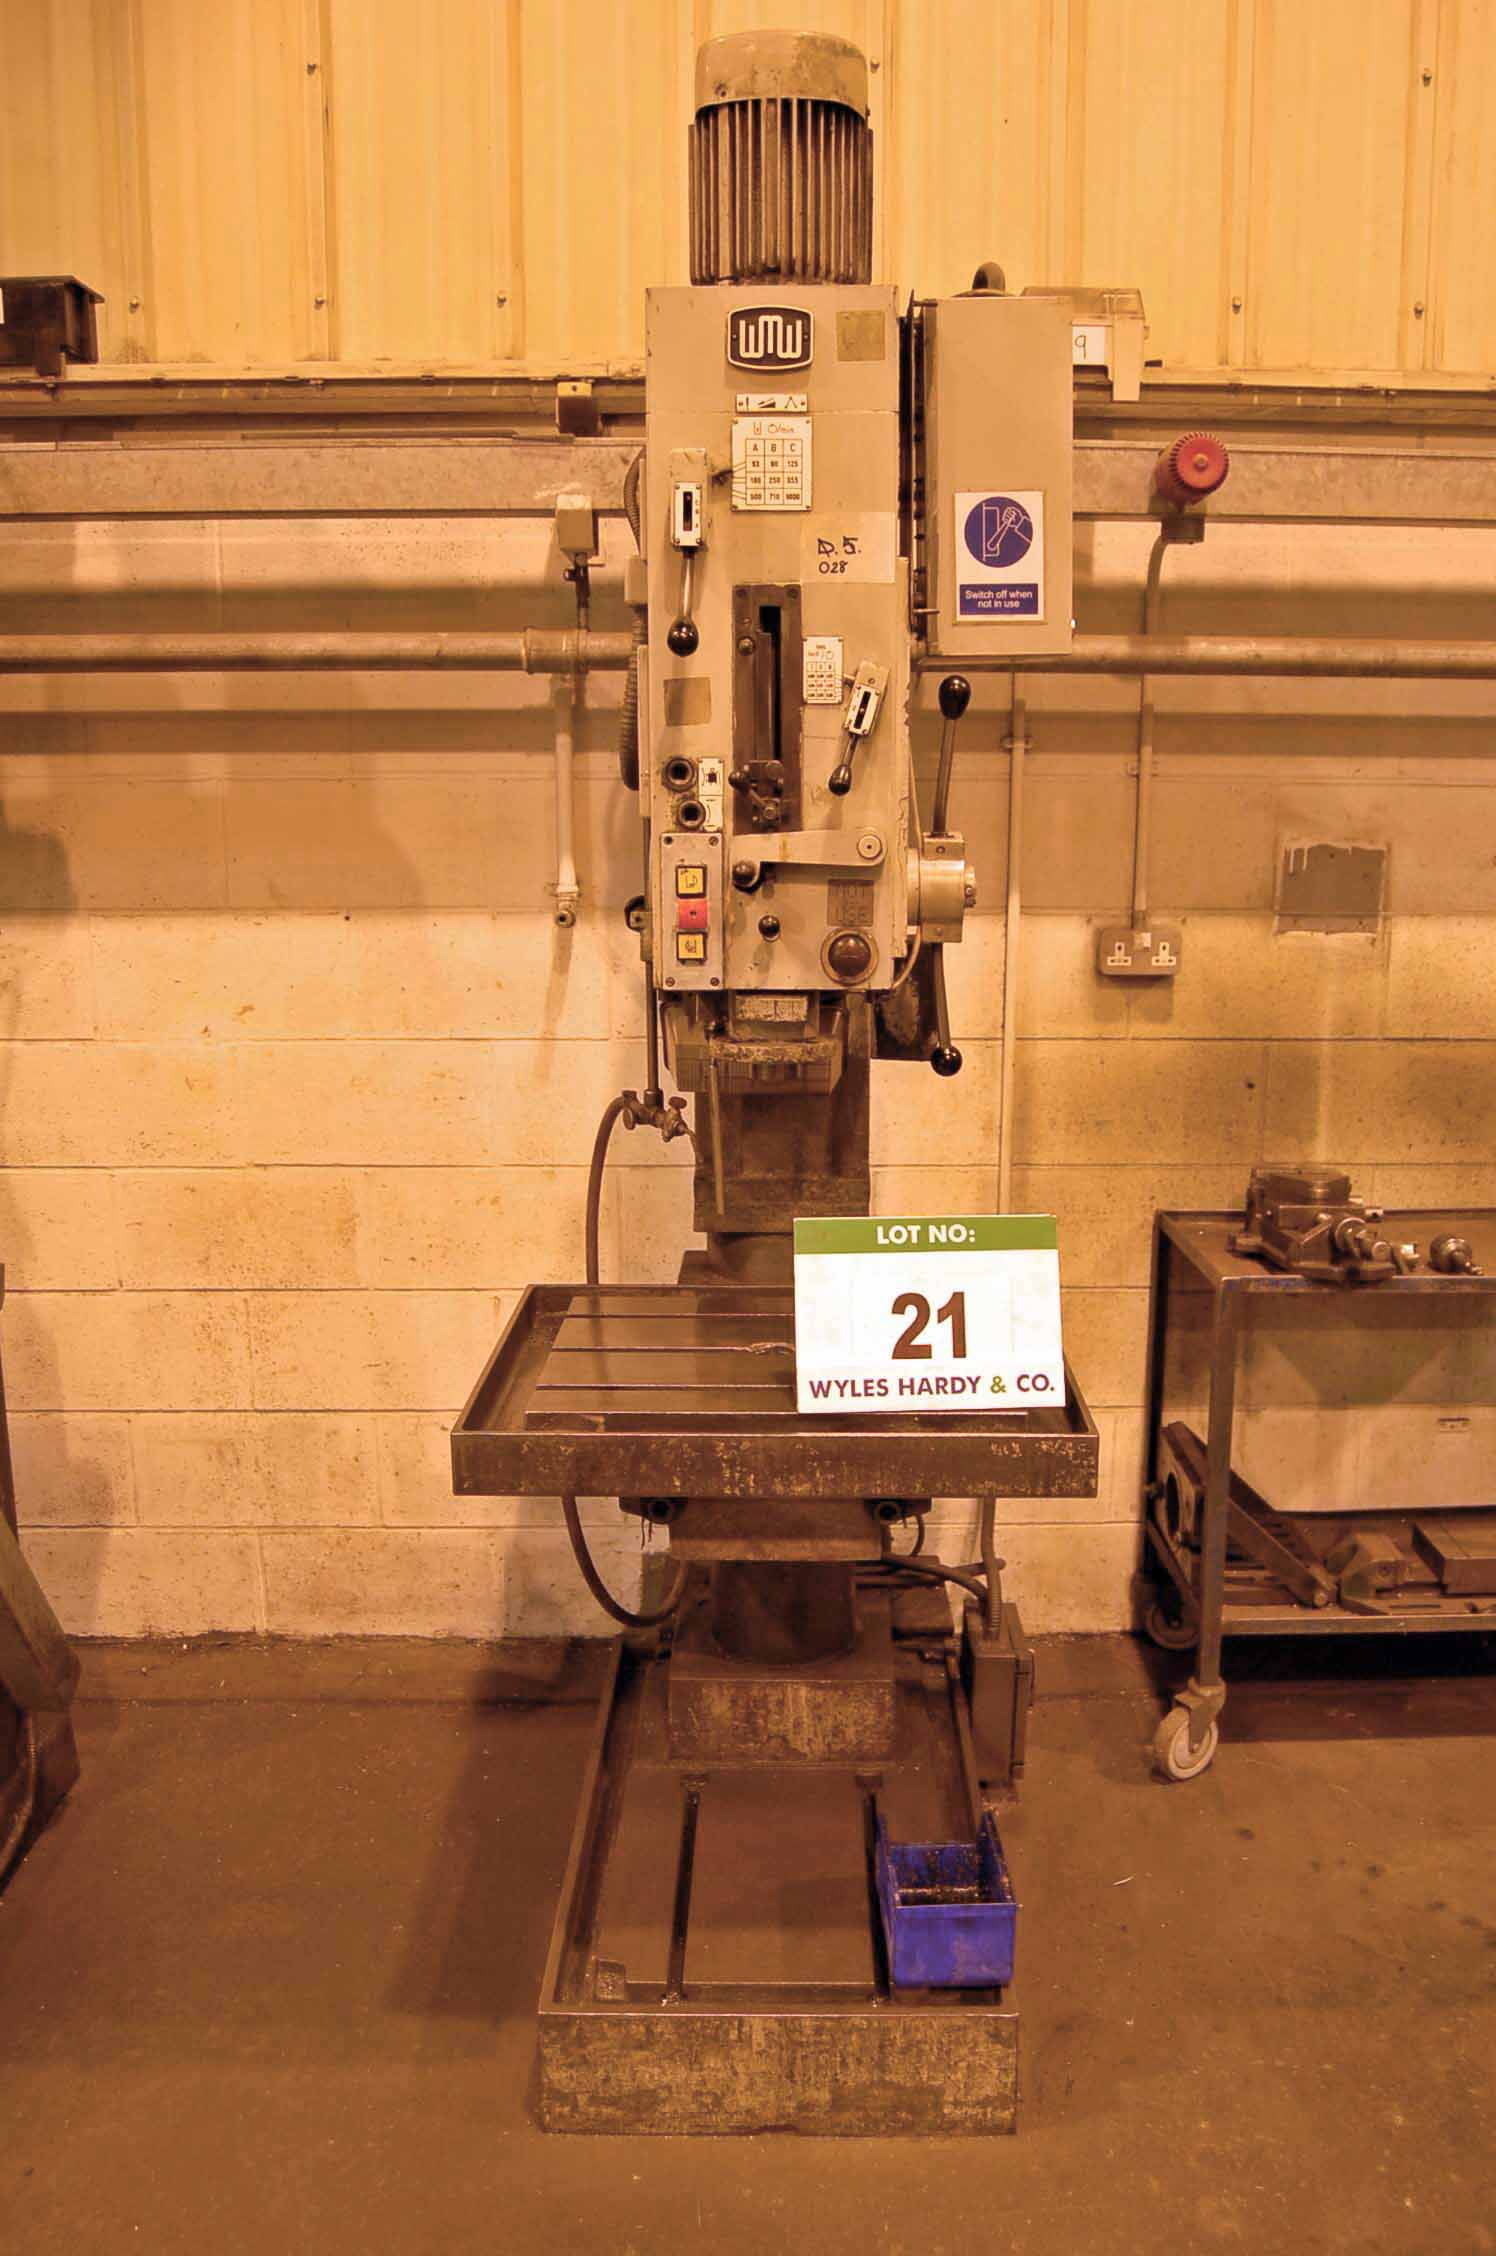 Lot 21 - A VEB WM STET FRITZ HECKERT Single Spindle Pillar Drilling Machine, Serial No. 16719, with 560mm x